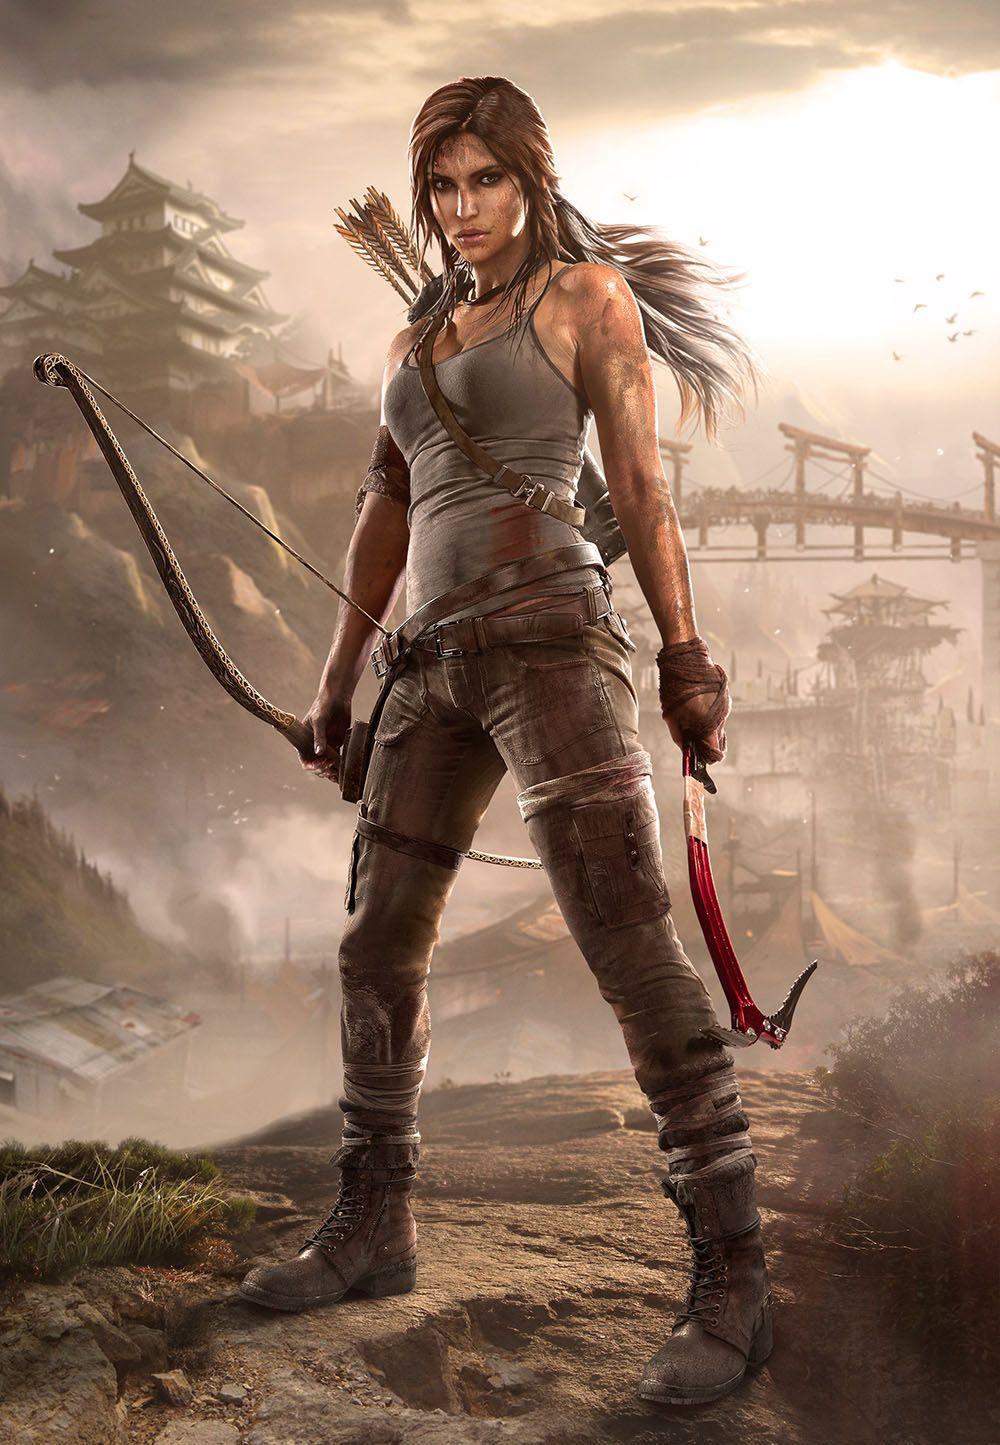 Pin By Sandi Smith On Lara Kroft Tomb Raider Lara Croft Tomb